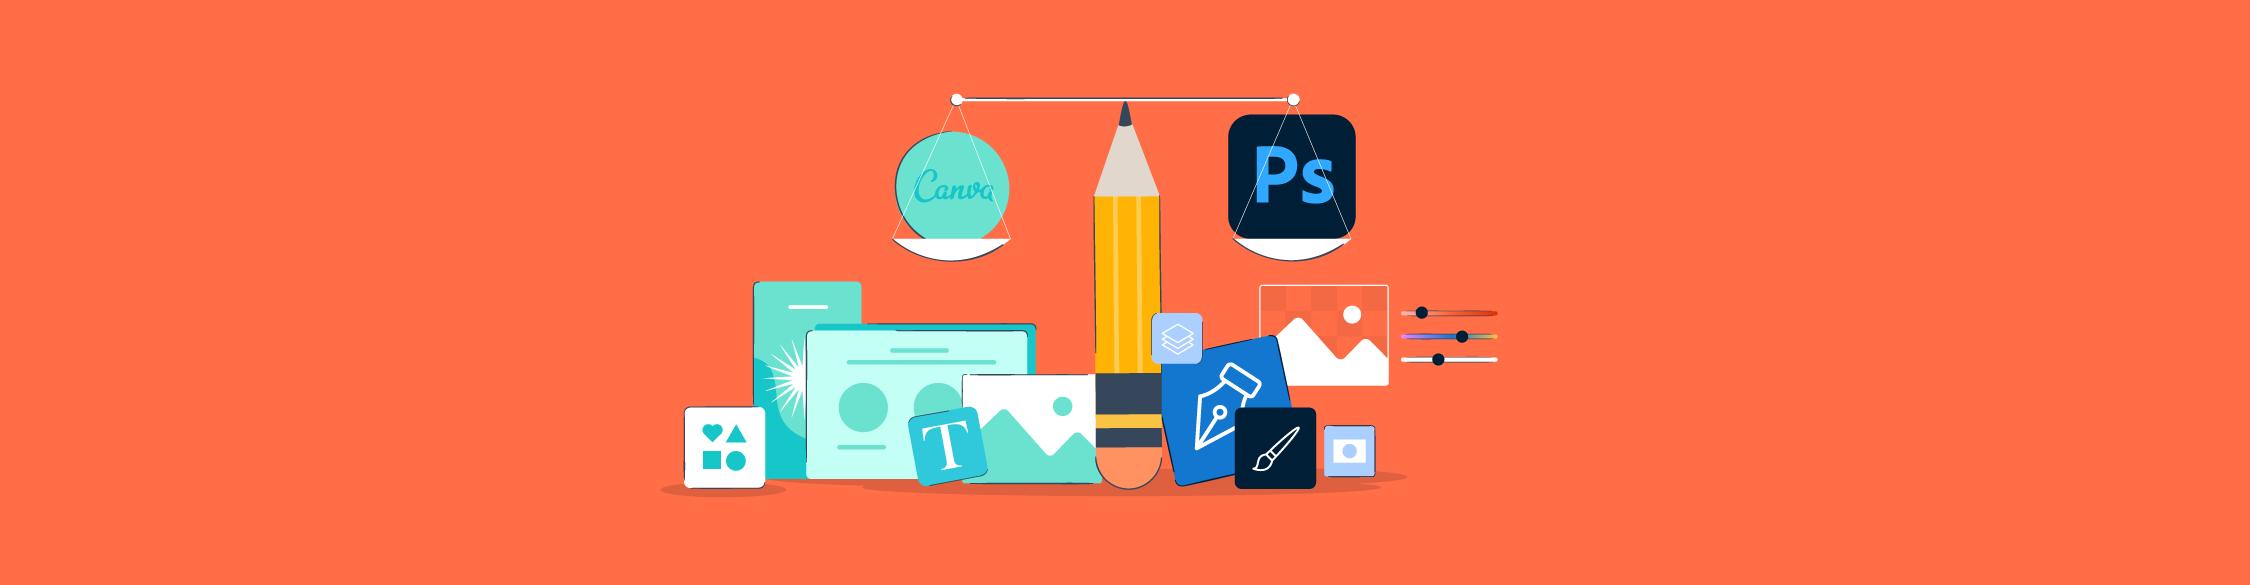 Canva vs Photoshop: Best Design Tool for Non-Designers (2021)